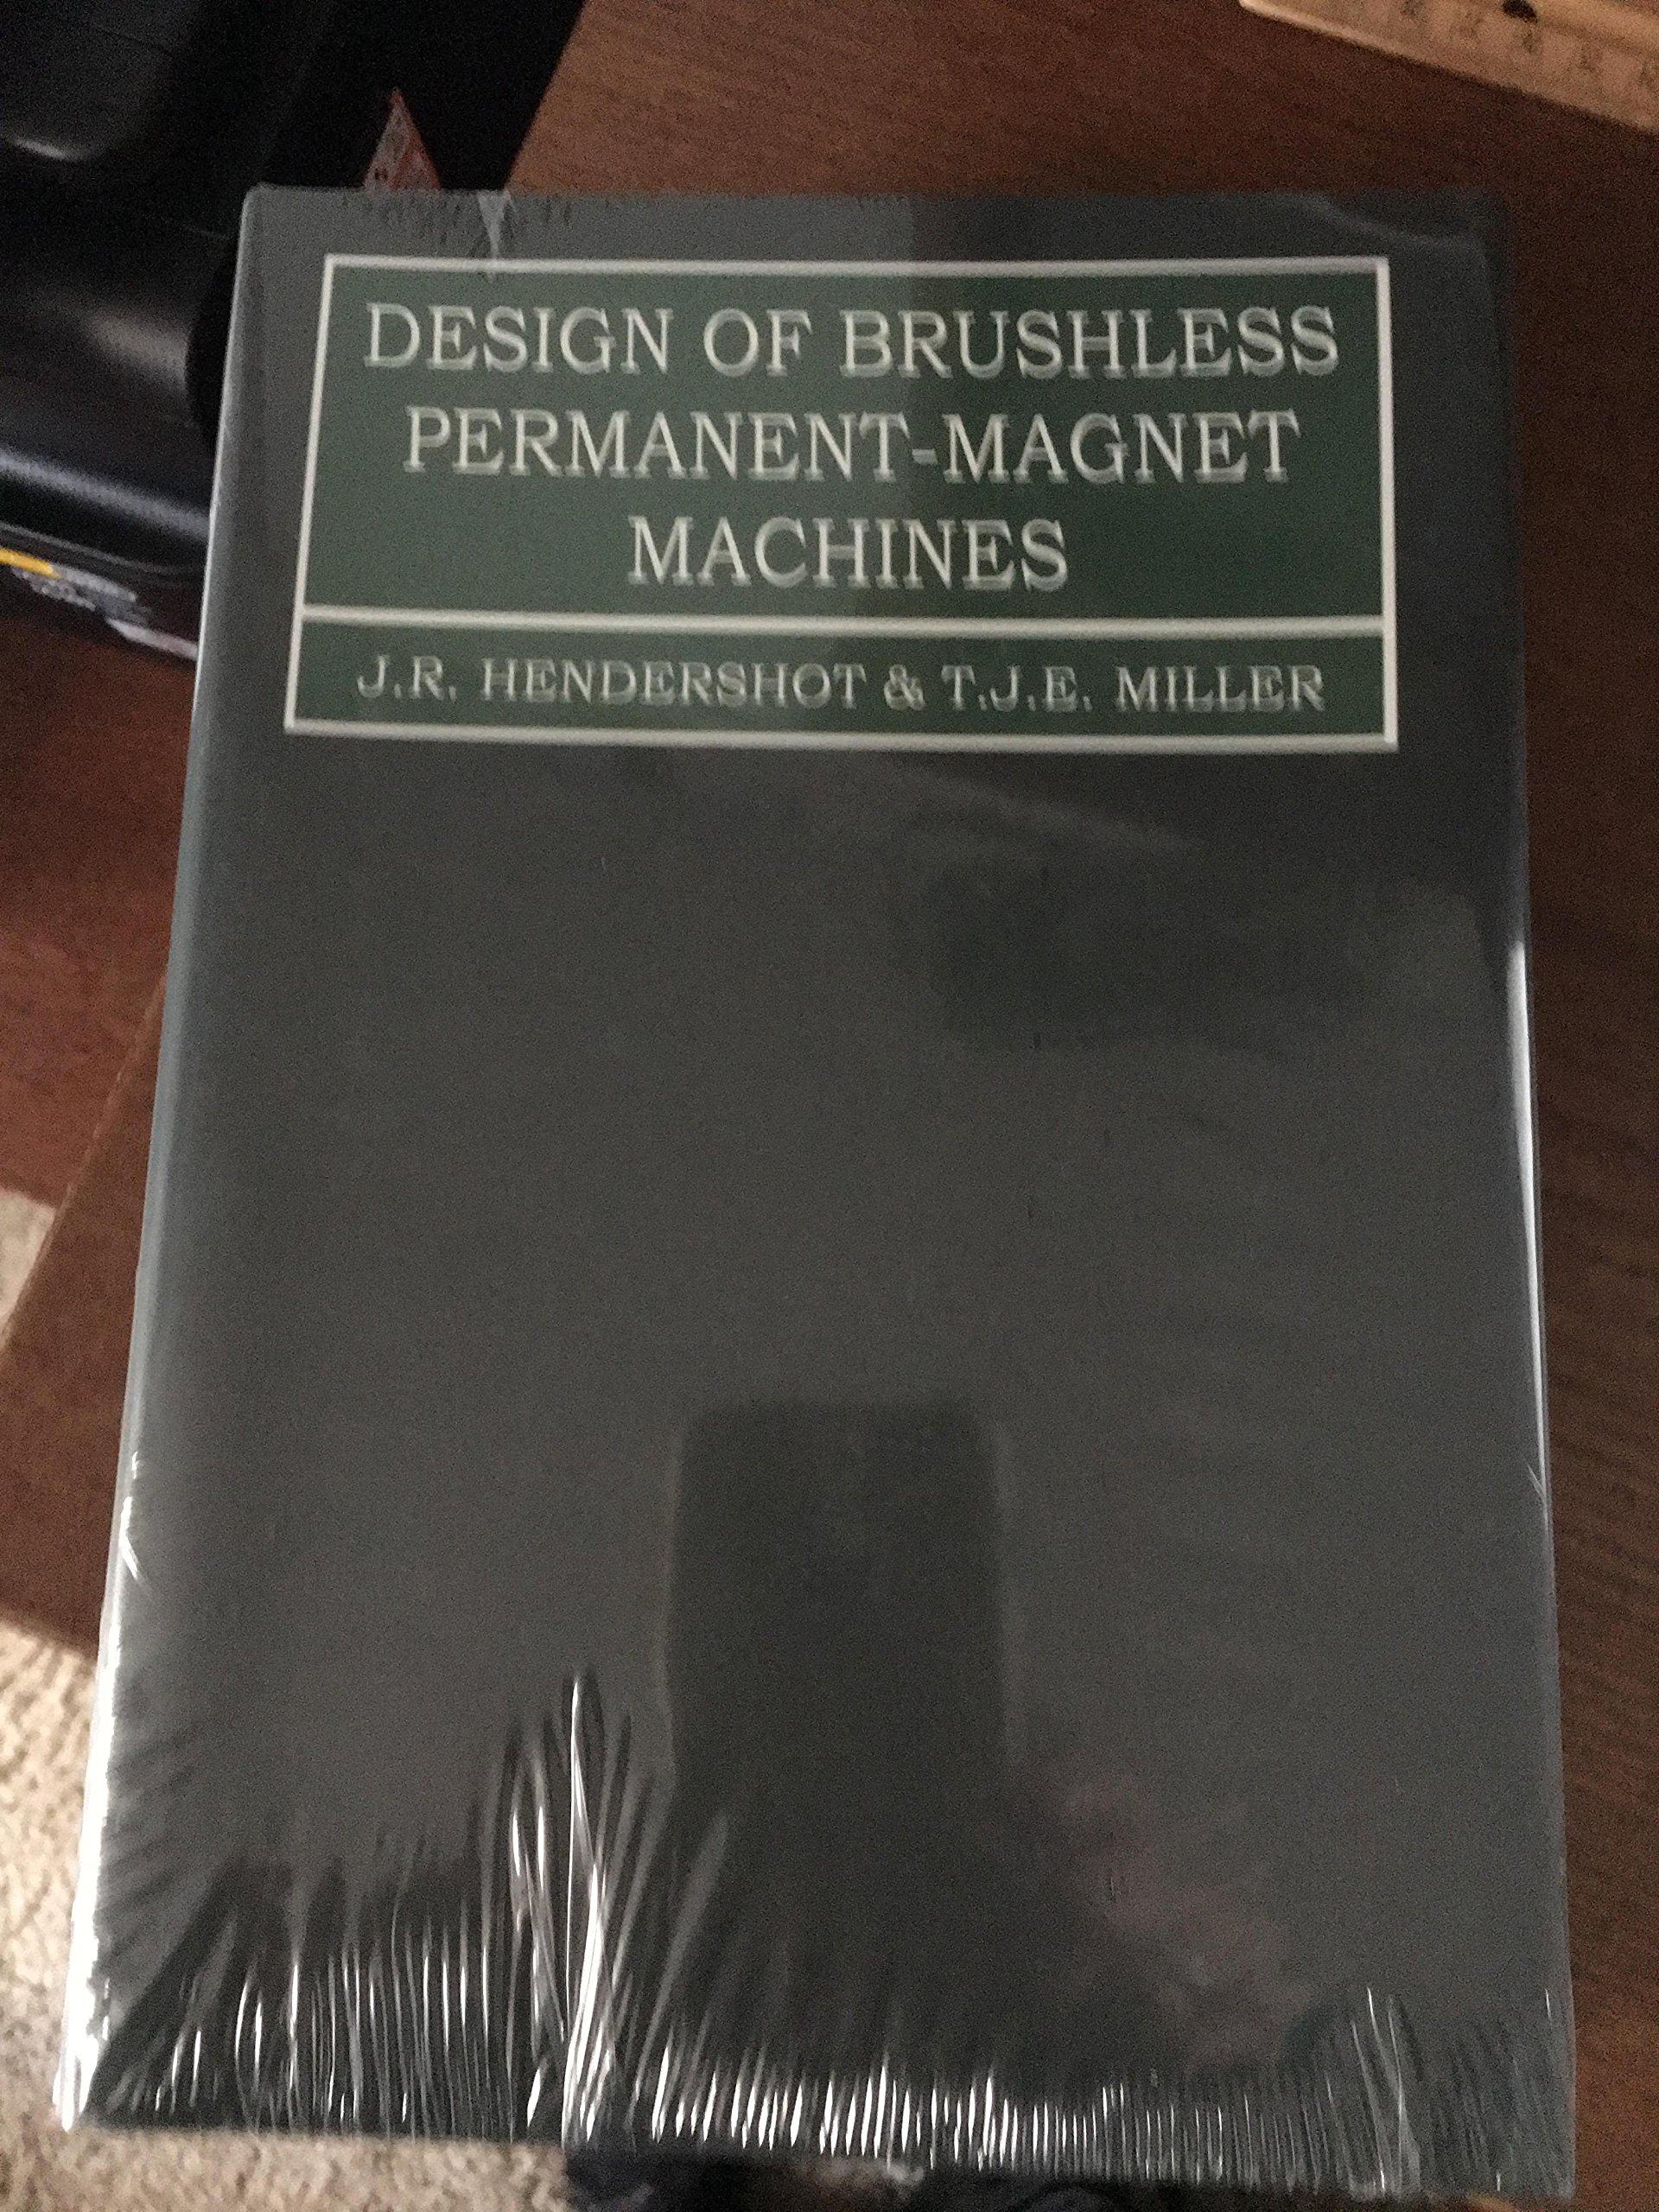 Design of Brushless Permanent-Magnet Machines: J R